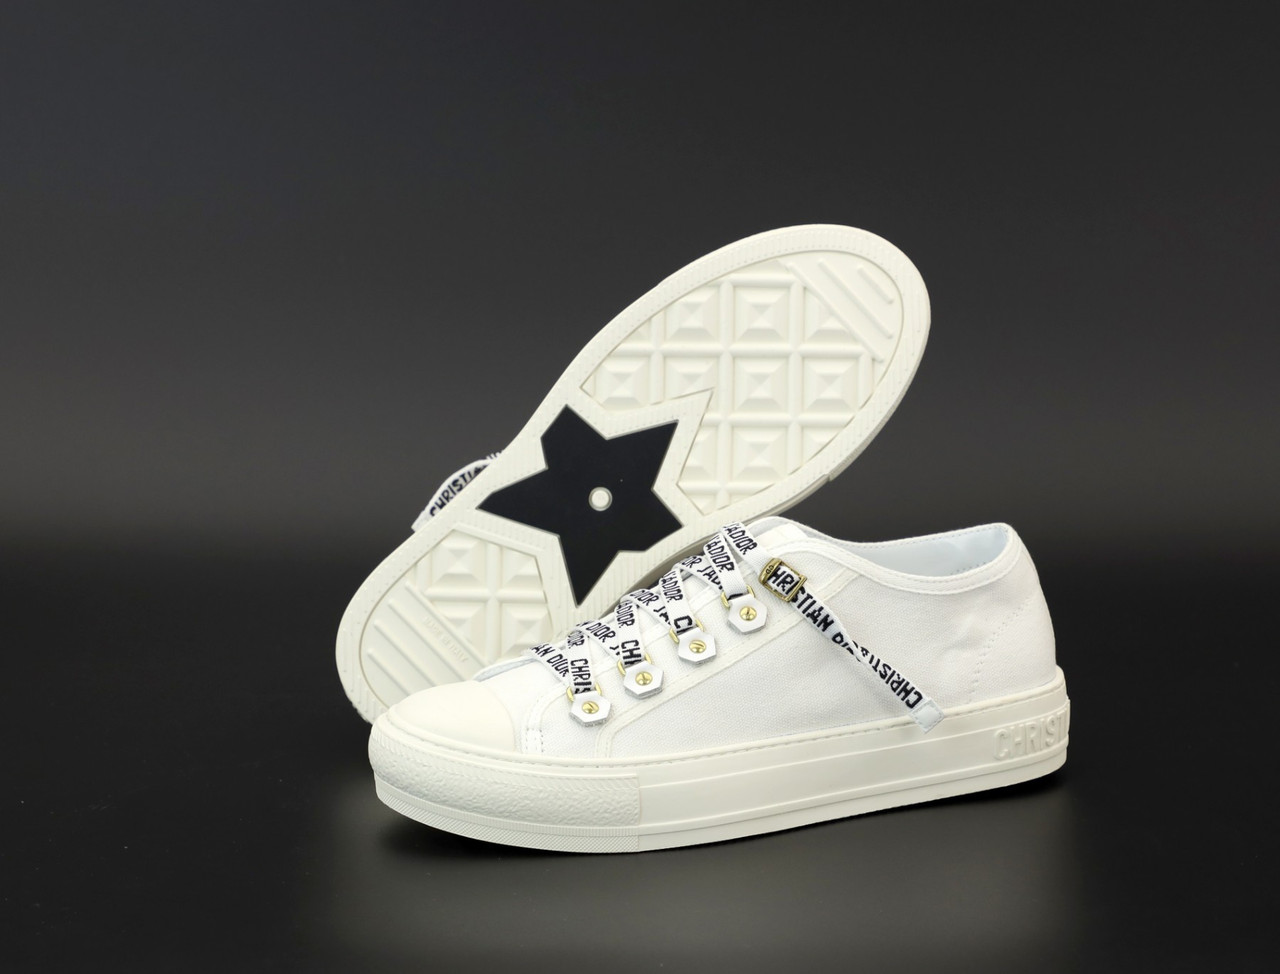 Женские кеды кроссовки Dior Sneakers. White ТОП реплика ААА класса.